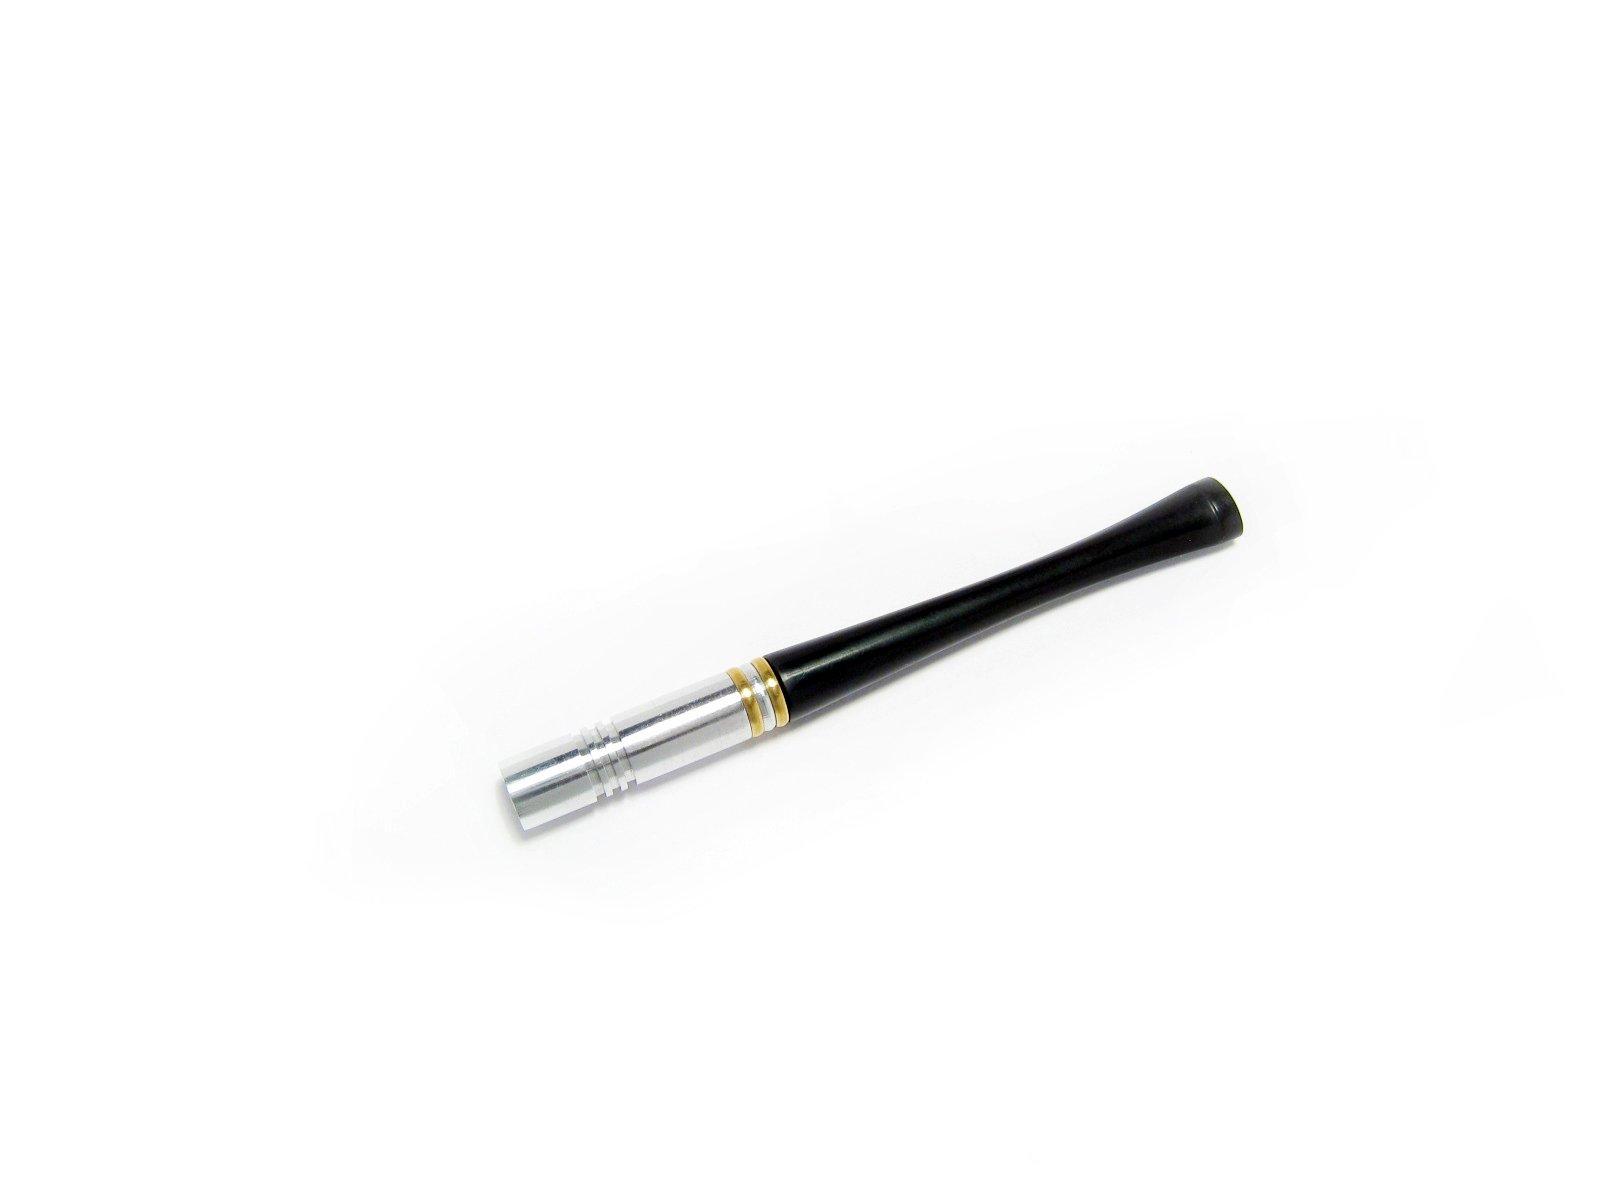 Unique Metal Cigarette Holder 3.5'' / Fits Regular/Super Slims Cigarettes and Box Fashion Pipes (Metal Super Slim)